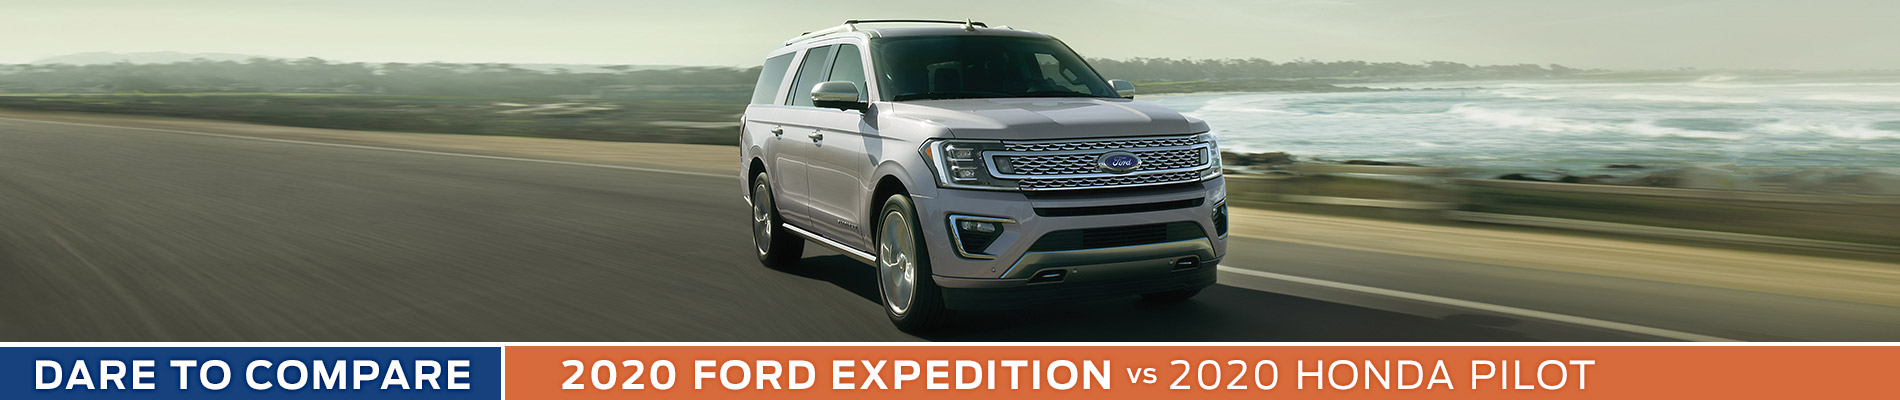 2020 Ford Expedition vs Honda Pilot - Sun State Ford - Orlando, FL